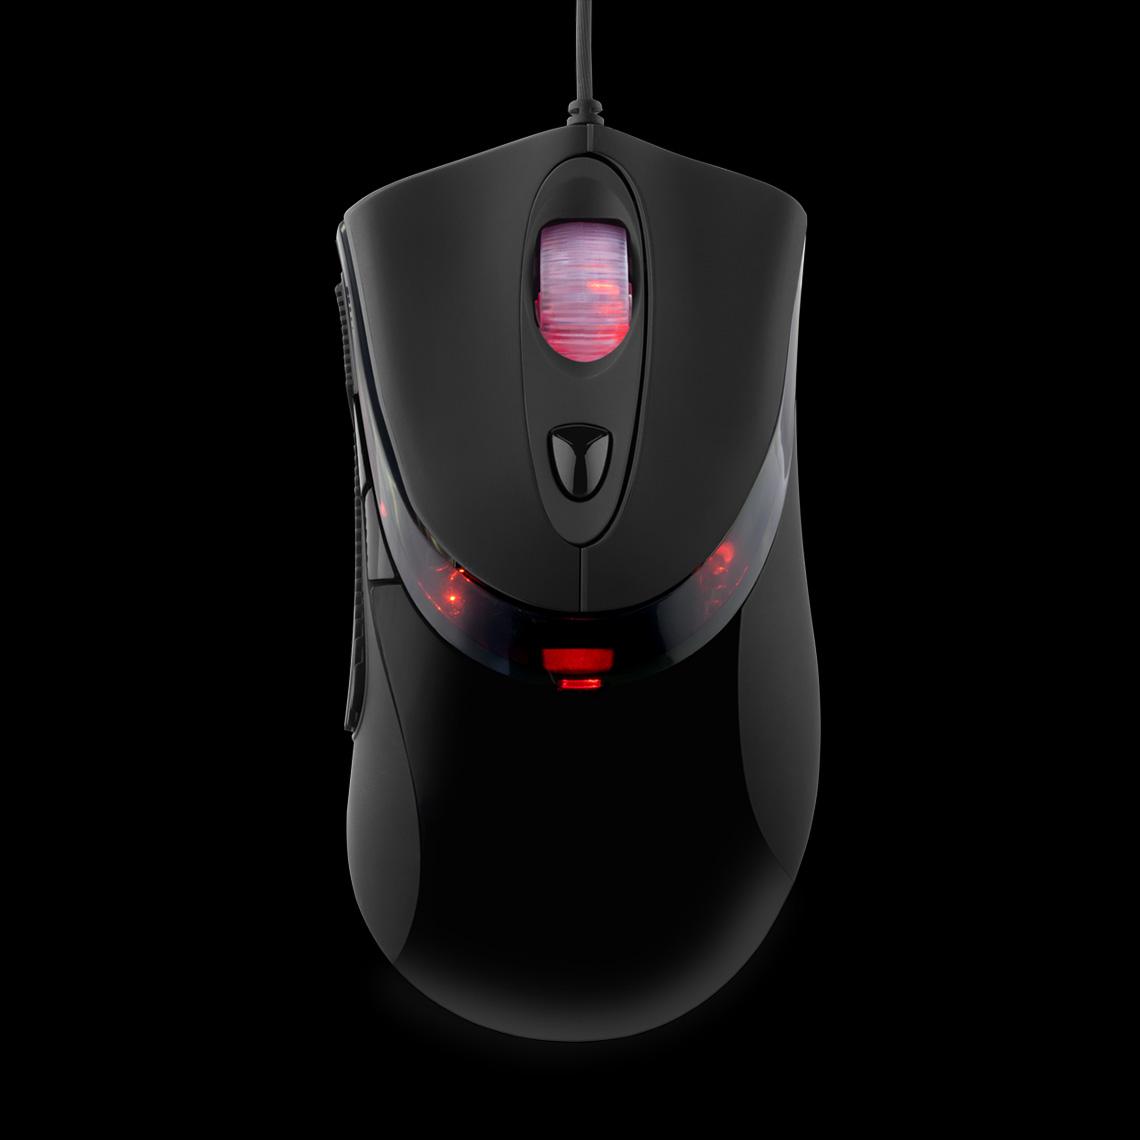 corsair_mouse_1140.jpg